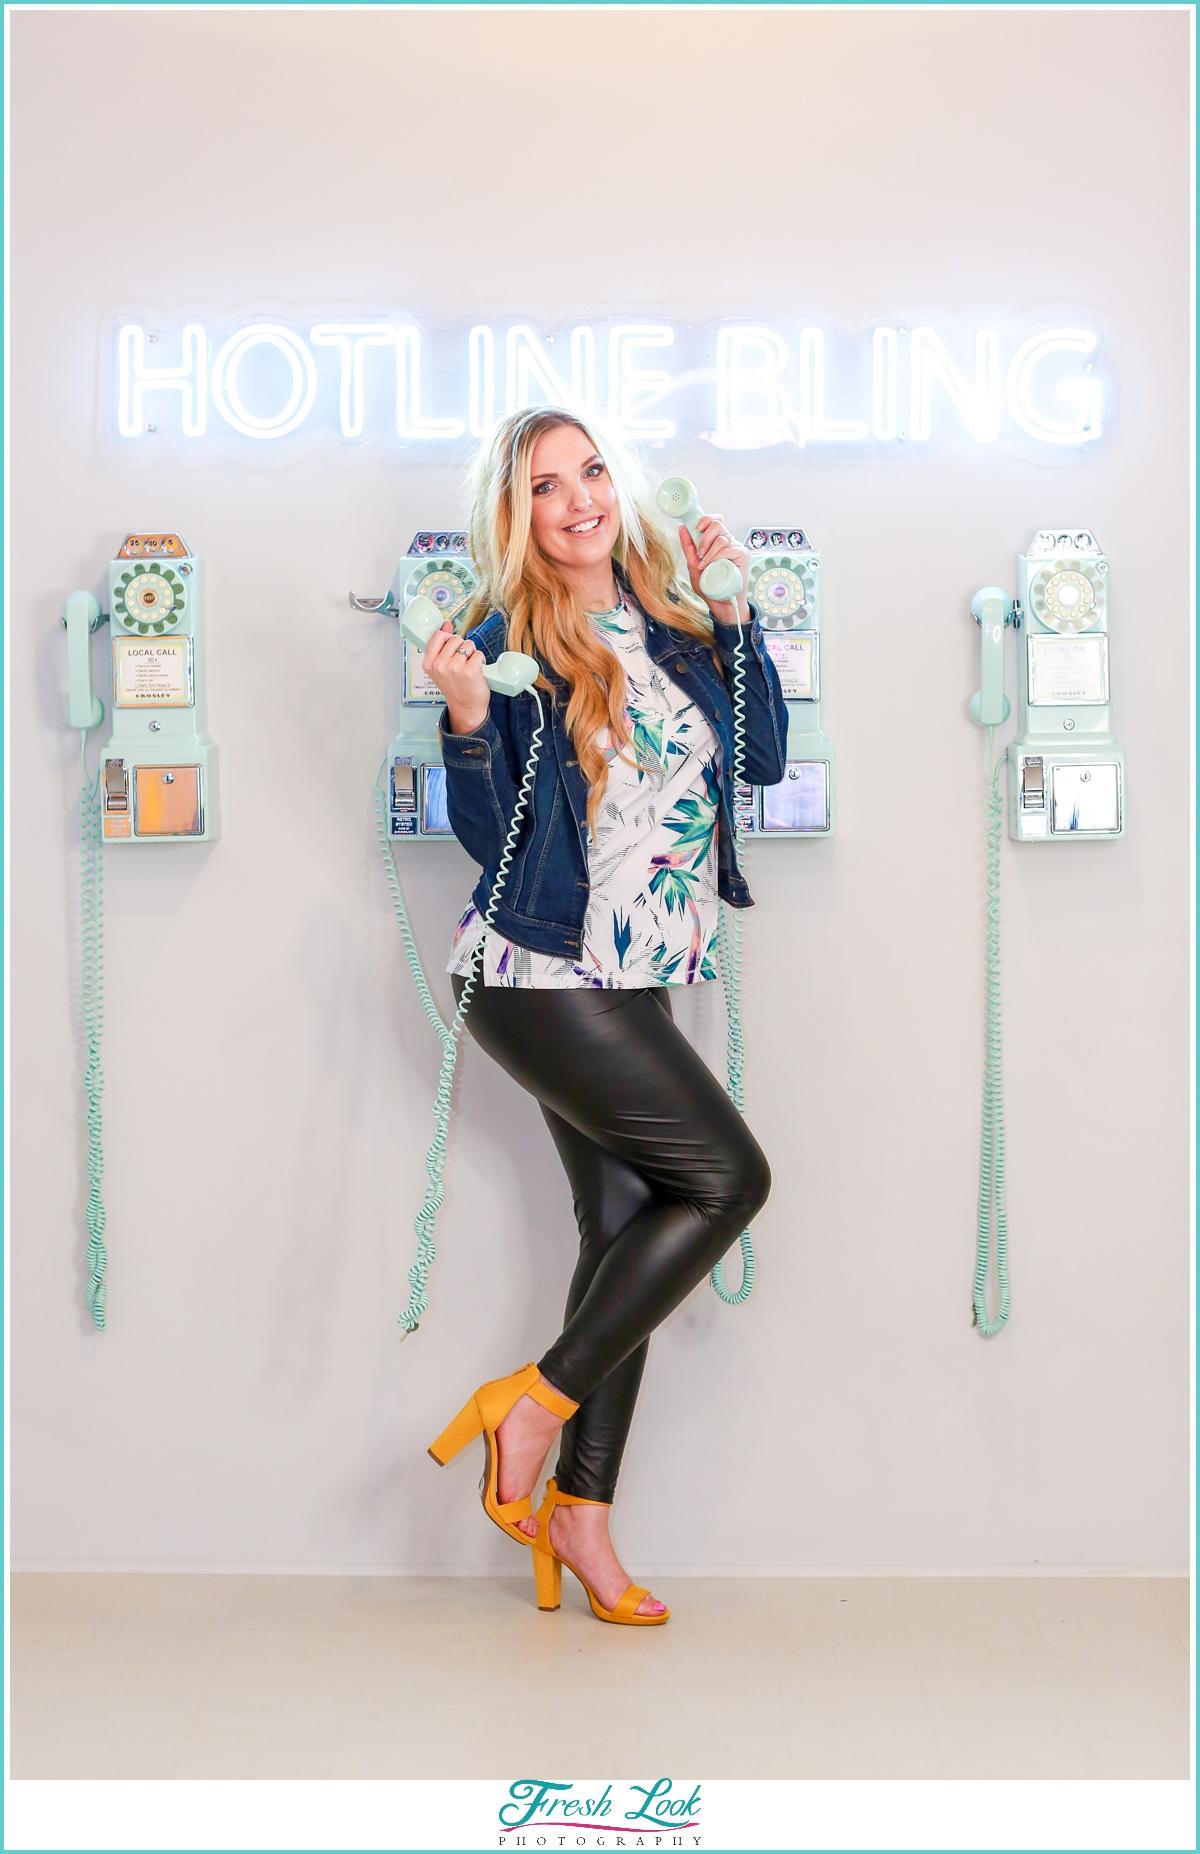 hotline bling fun photoshoot